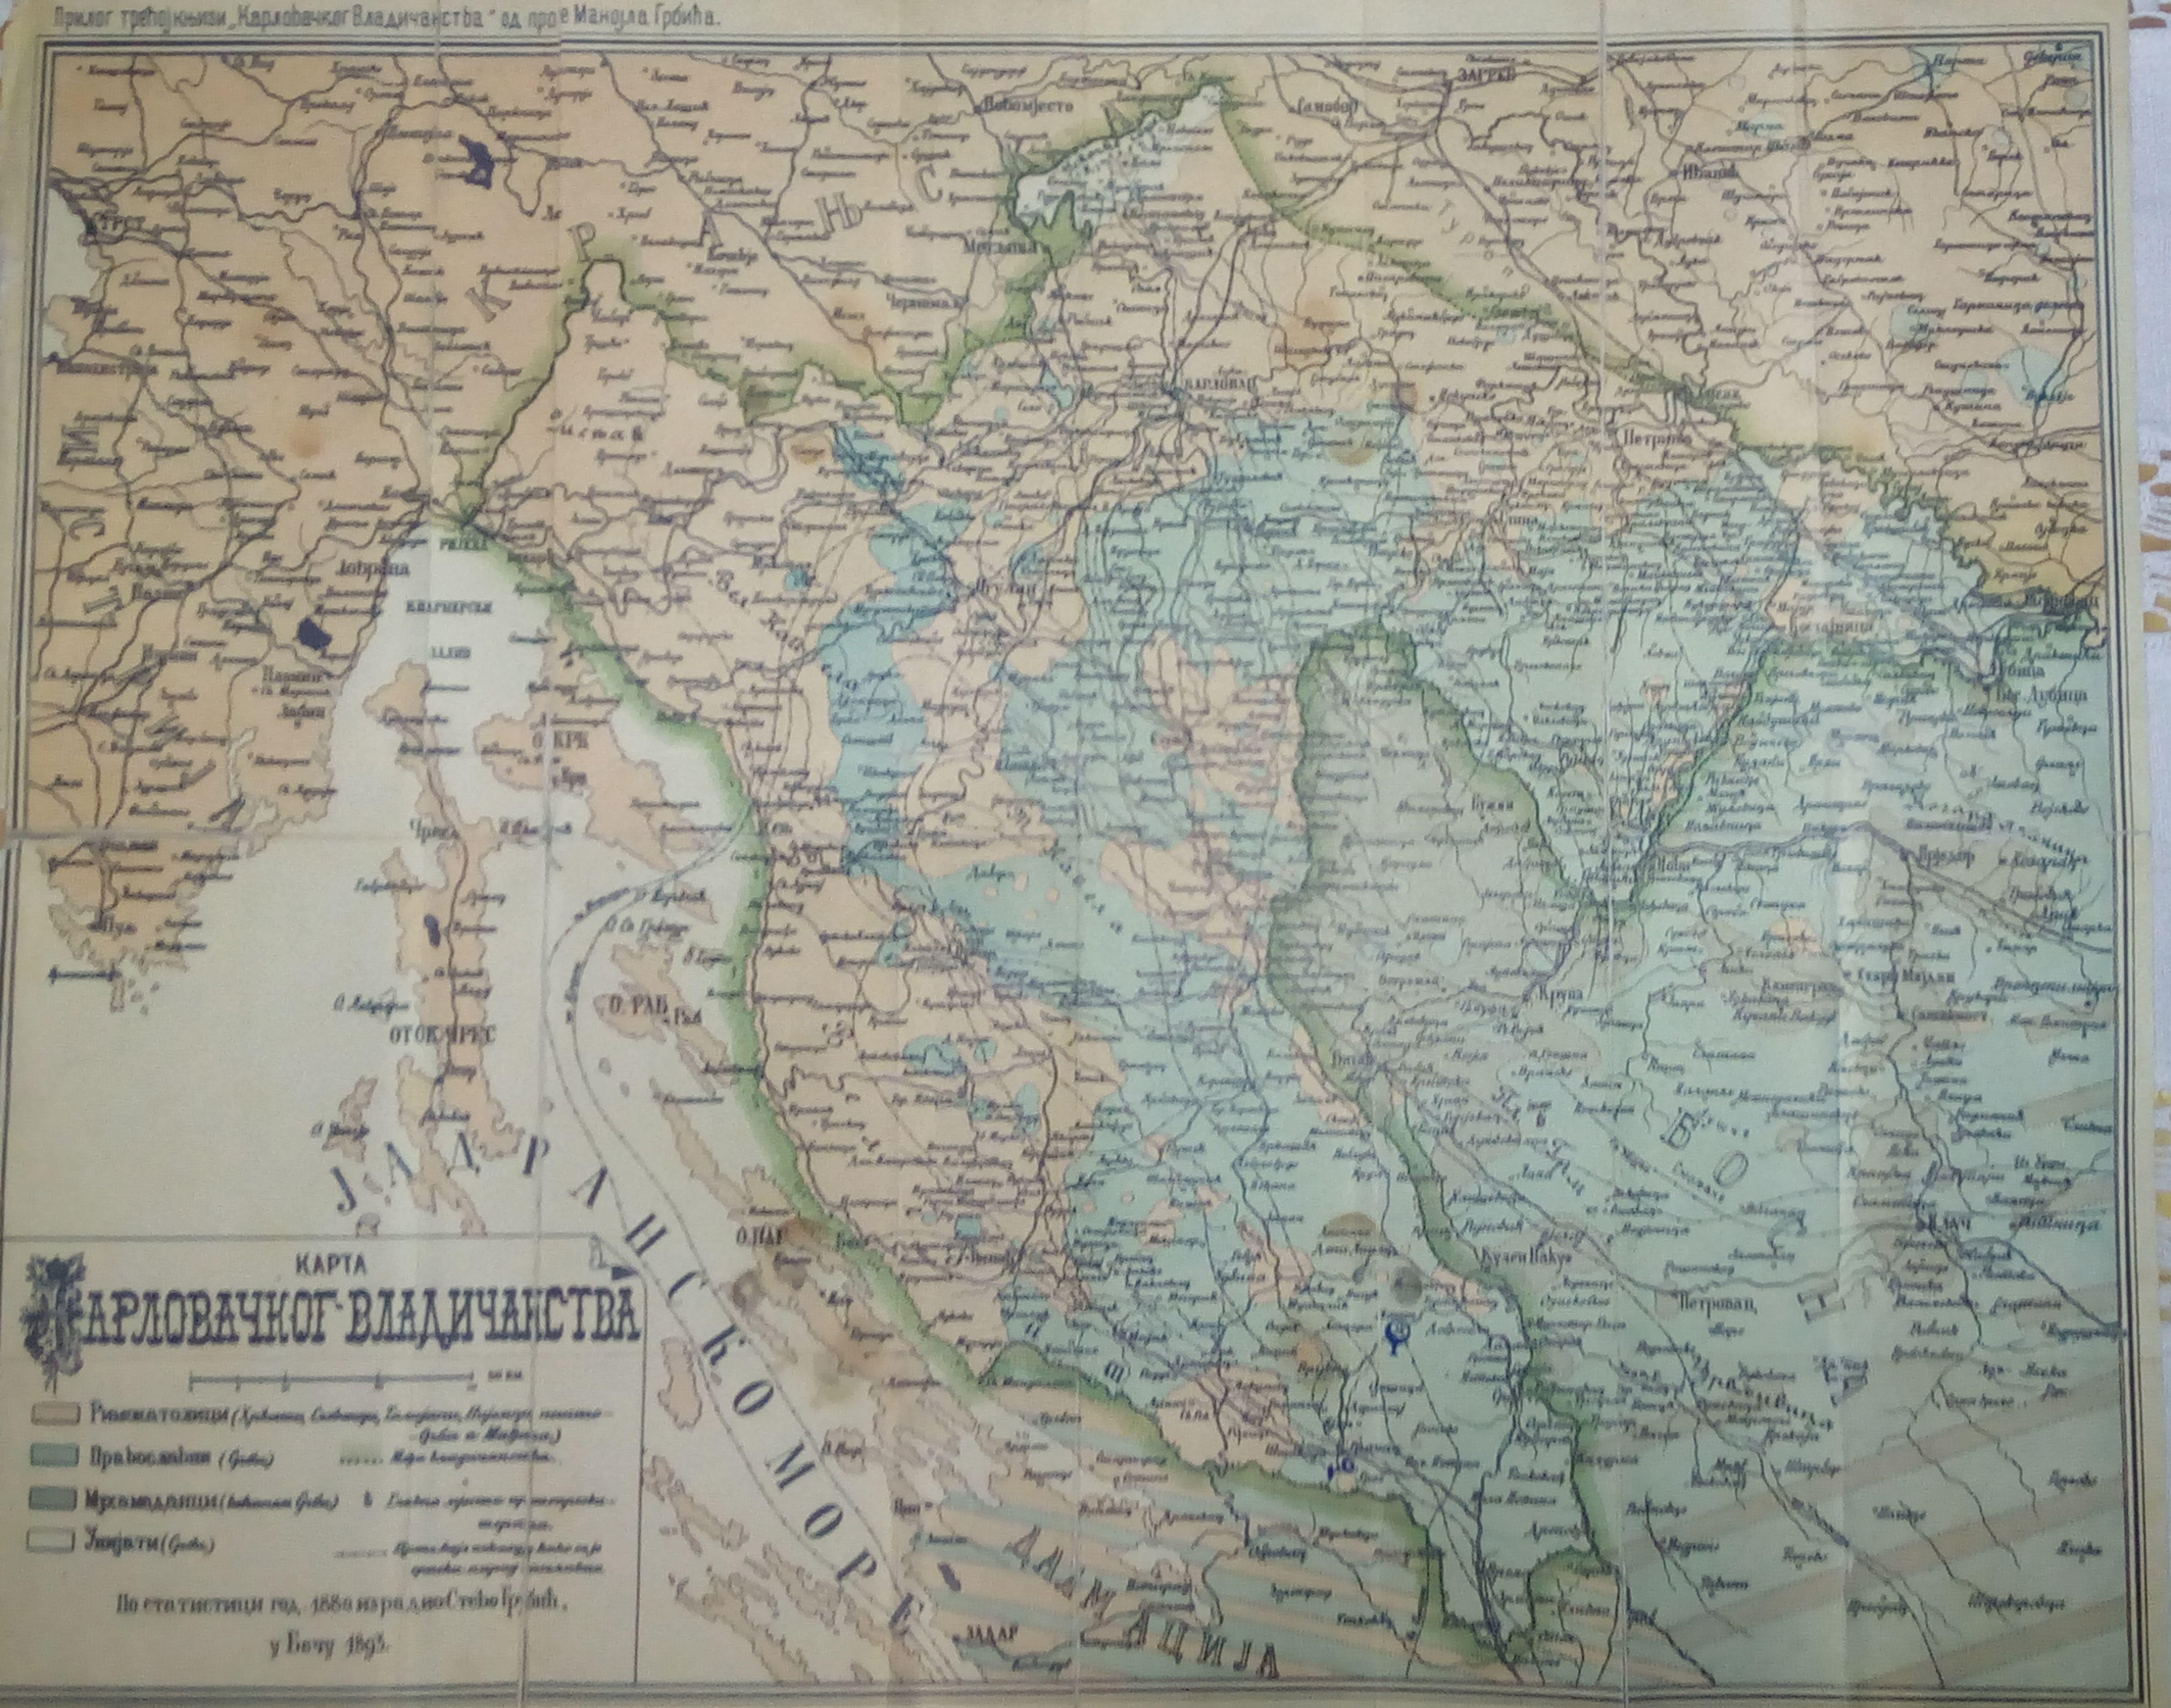 Etnografska karta Karlovackog vladicanstva